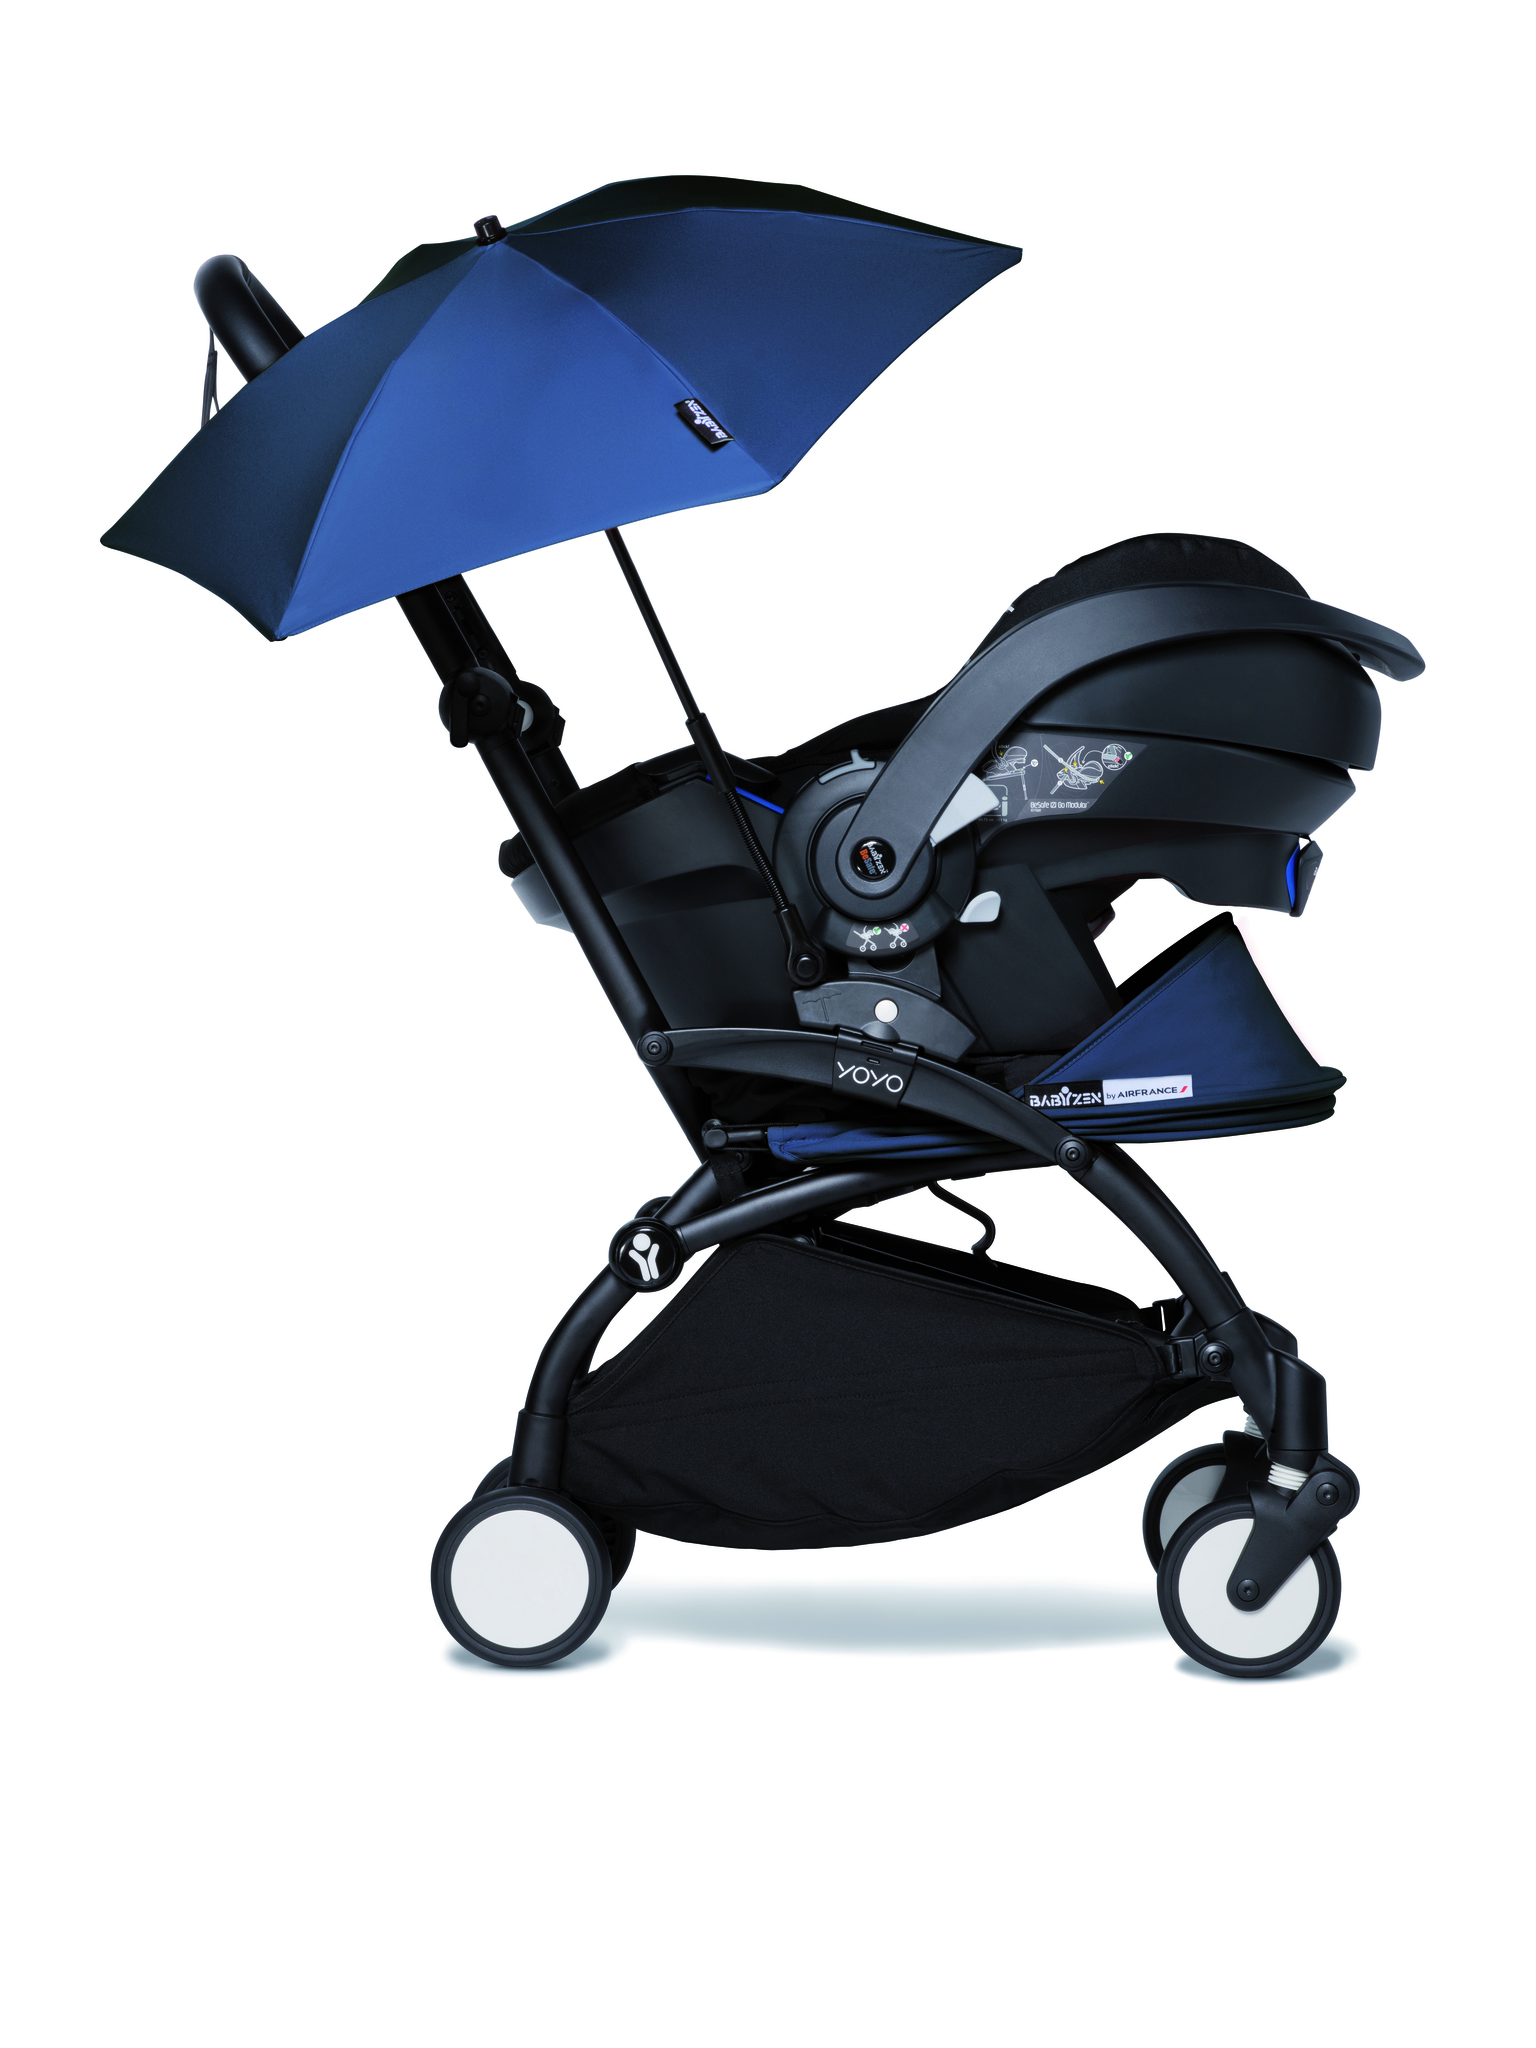 Зонт BabyZen YOYO + Navy Blue Синий